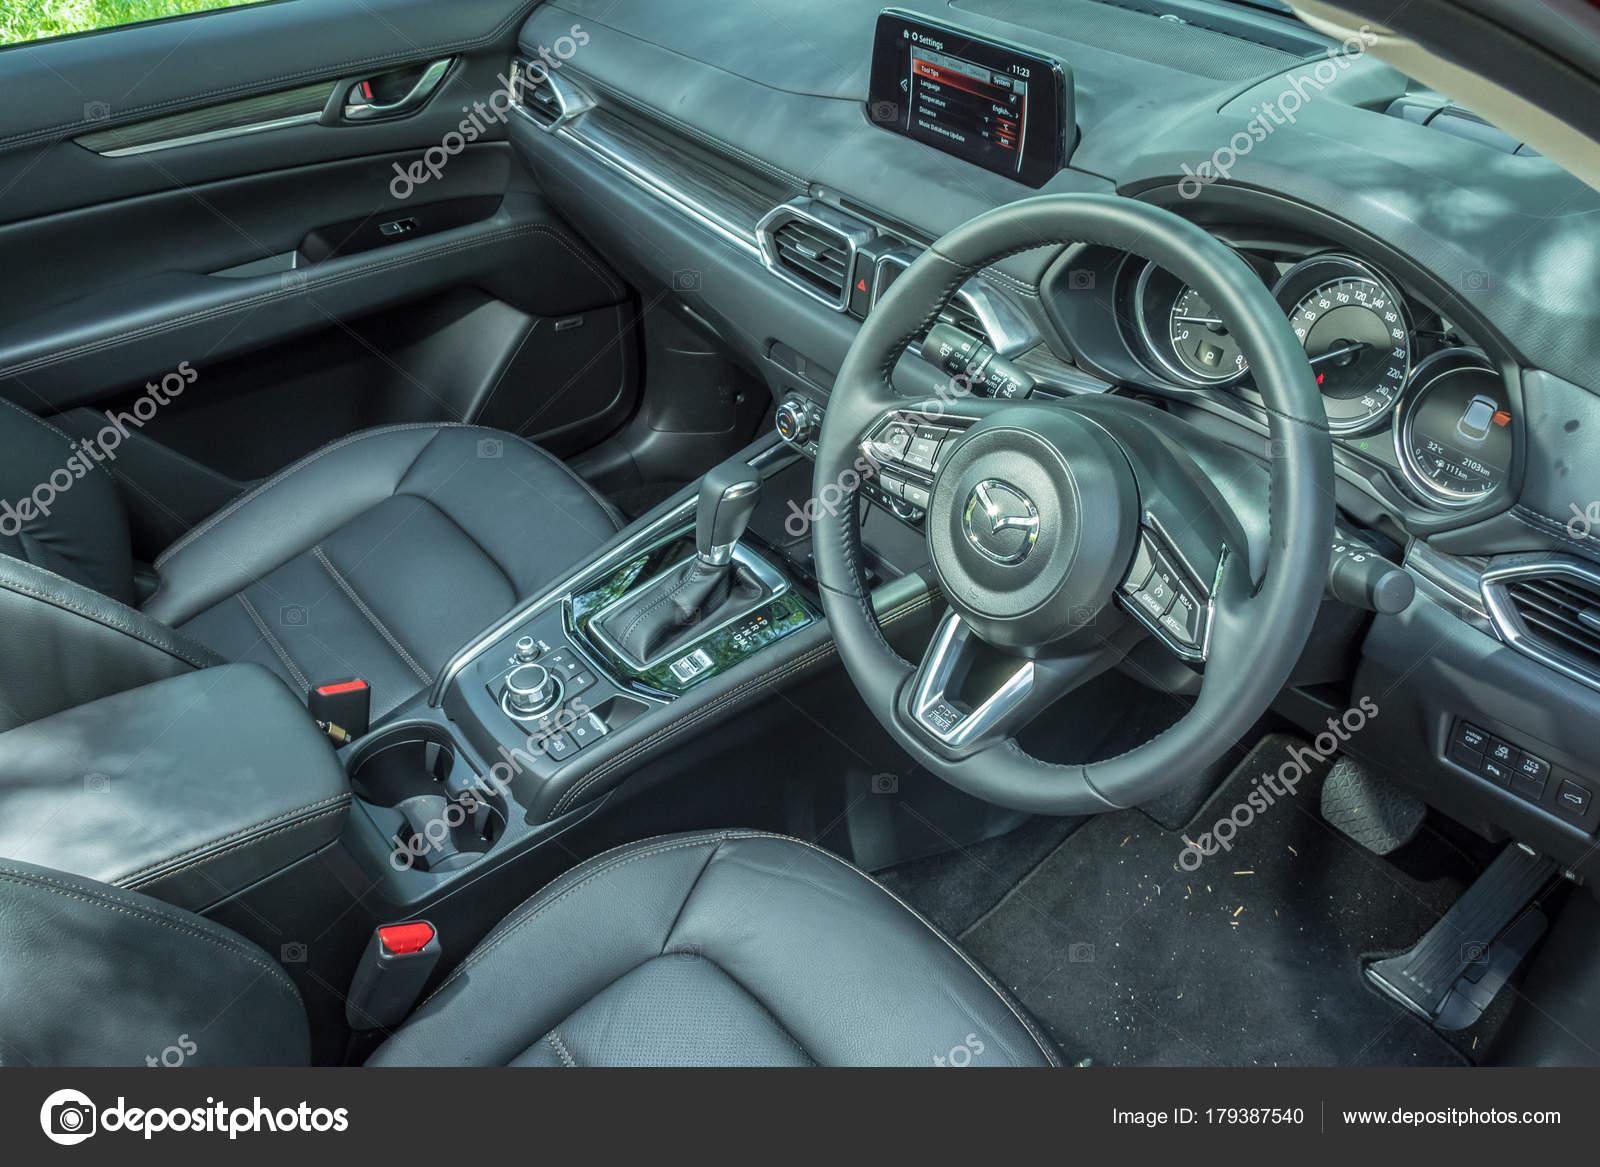 https://st3.depositphotos.com/6664102/17938/i/1600/depositphotos_179387540-stock-photo-mazda-cx-5-2017-interior.jpg